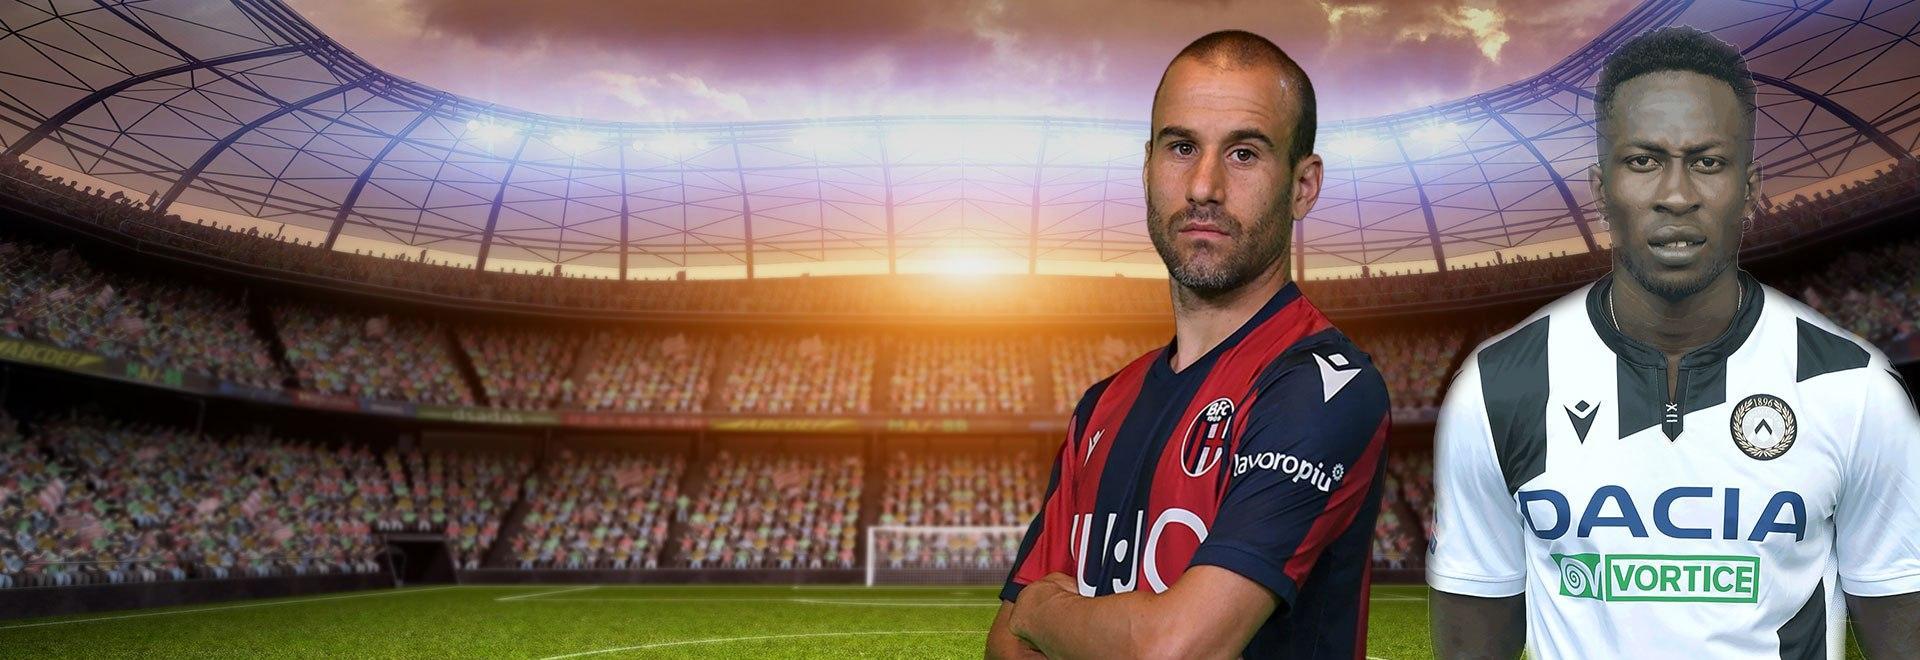 Bologna - Udinese. 25a g.